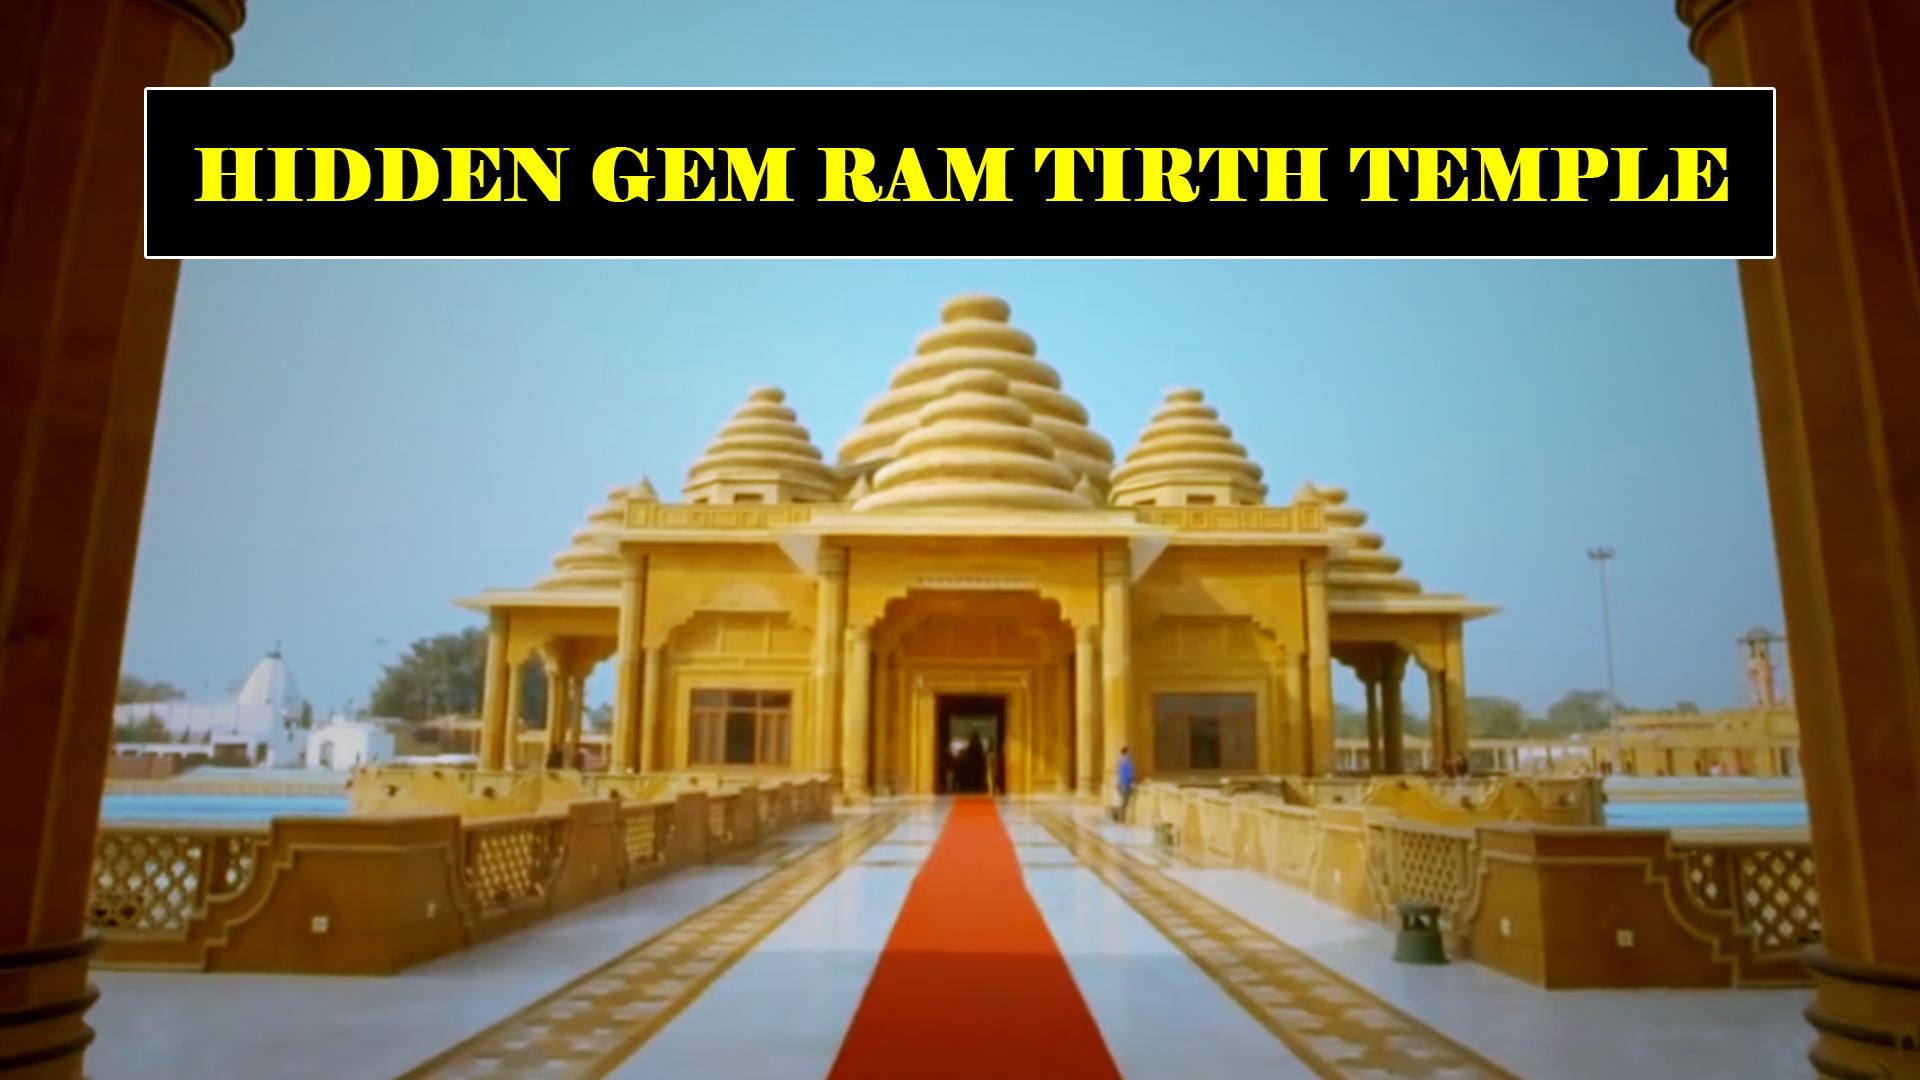 YT Thumb Ram Tirth